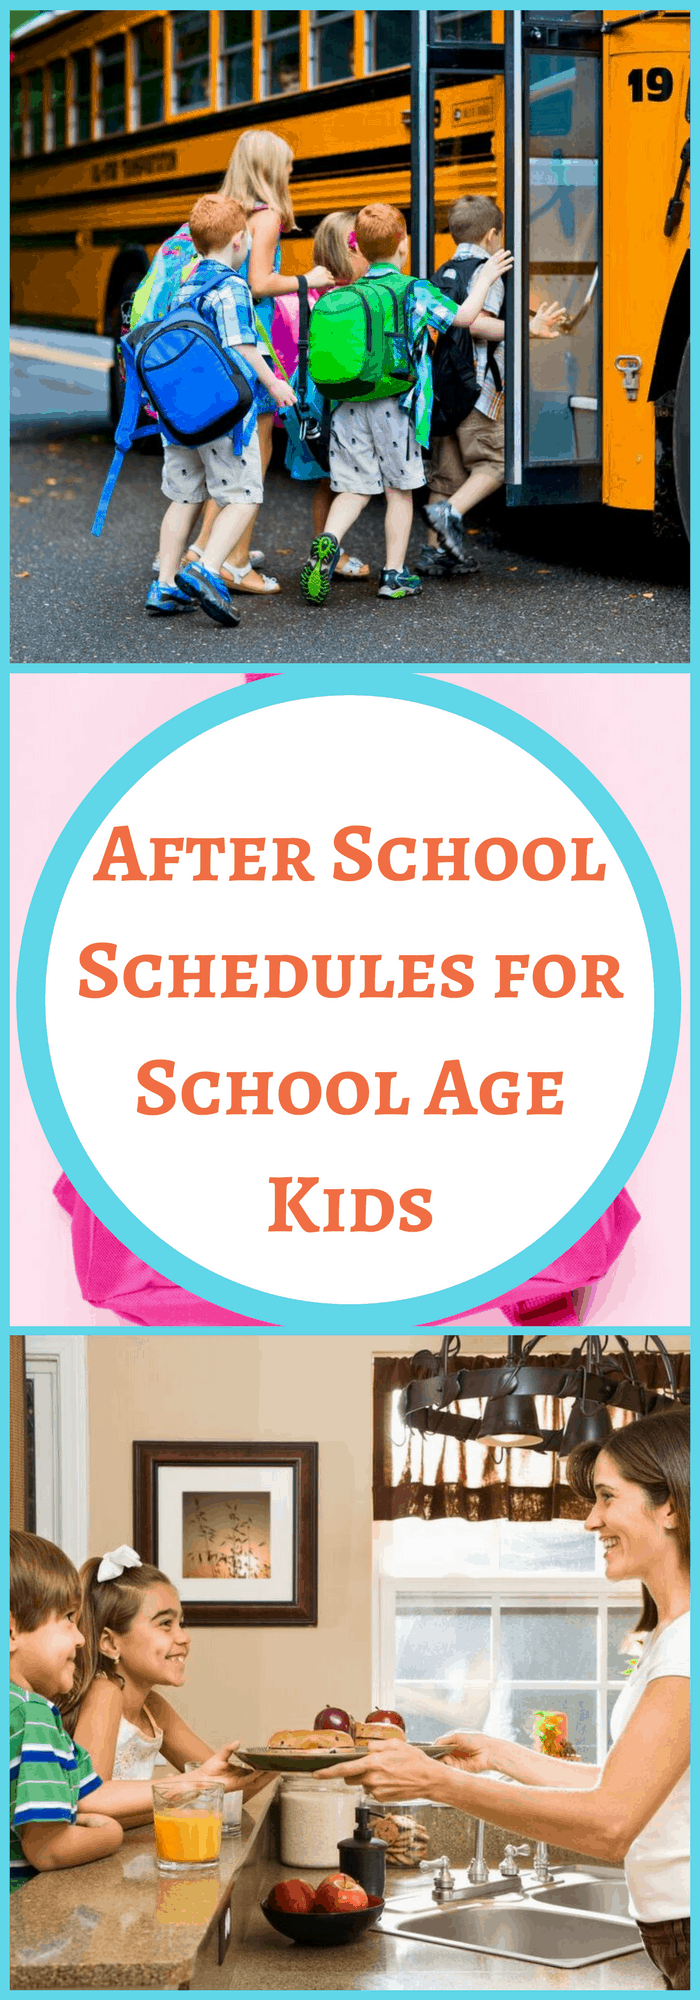 After School Schedules